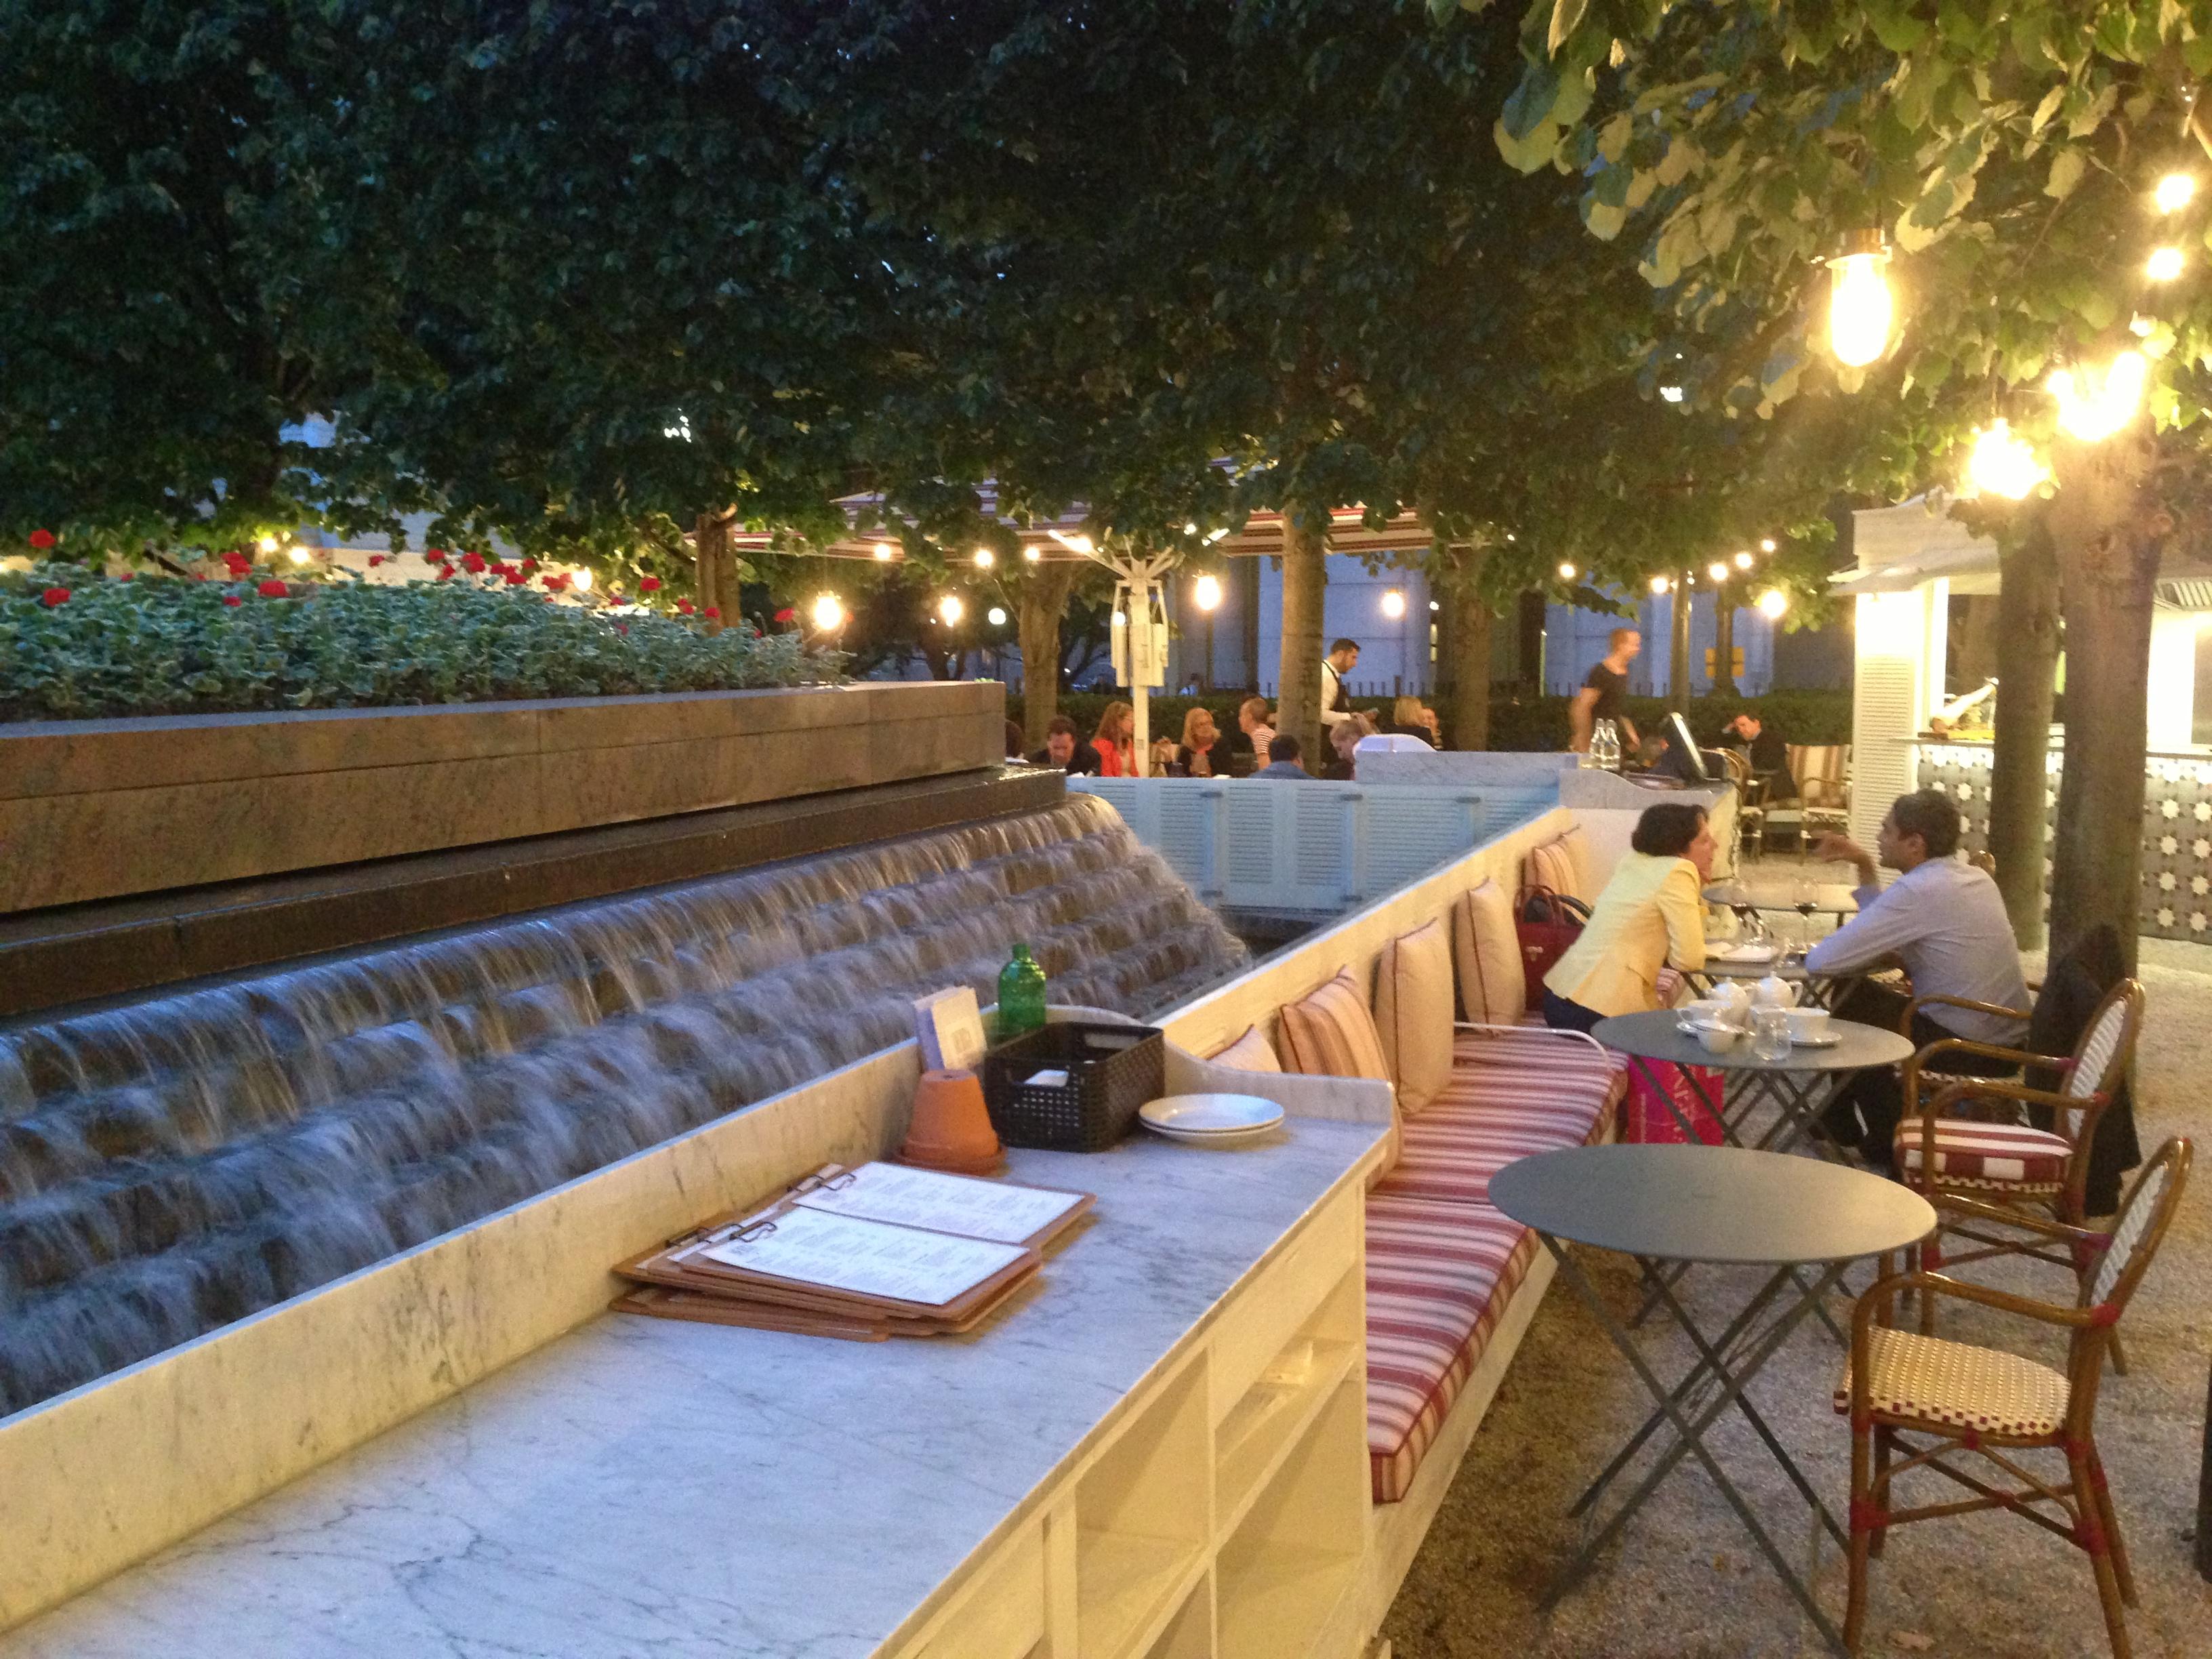 Iberica la terraza restaurant review frost magazine for Terrazas johnsons